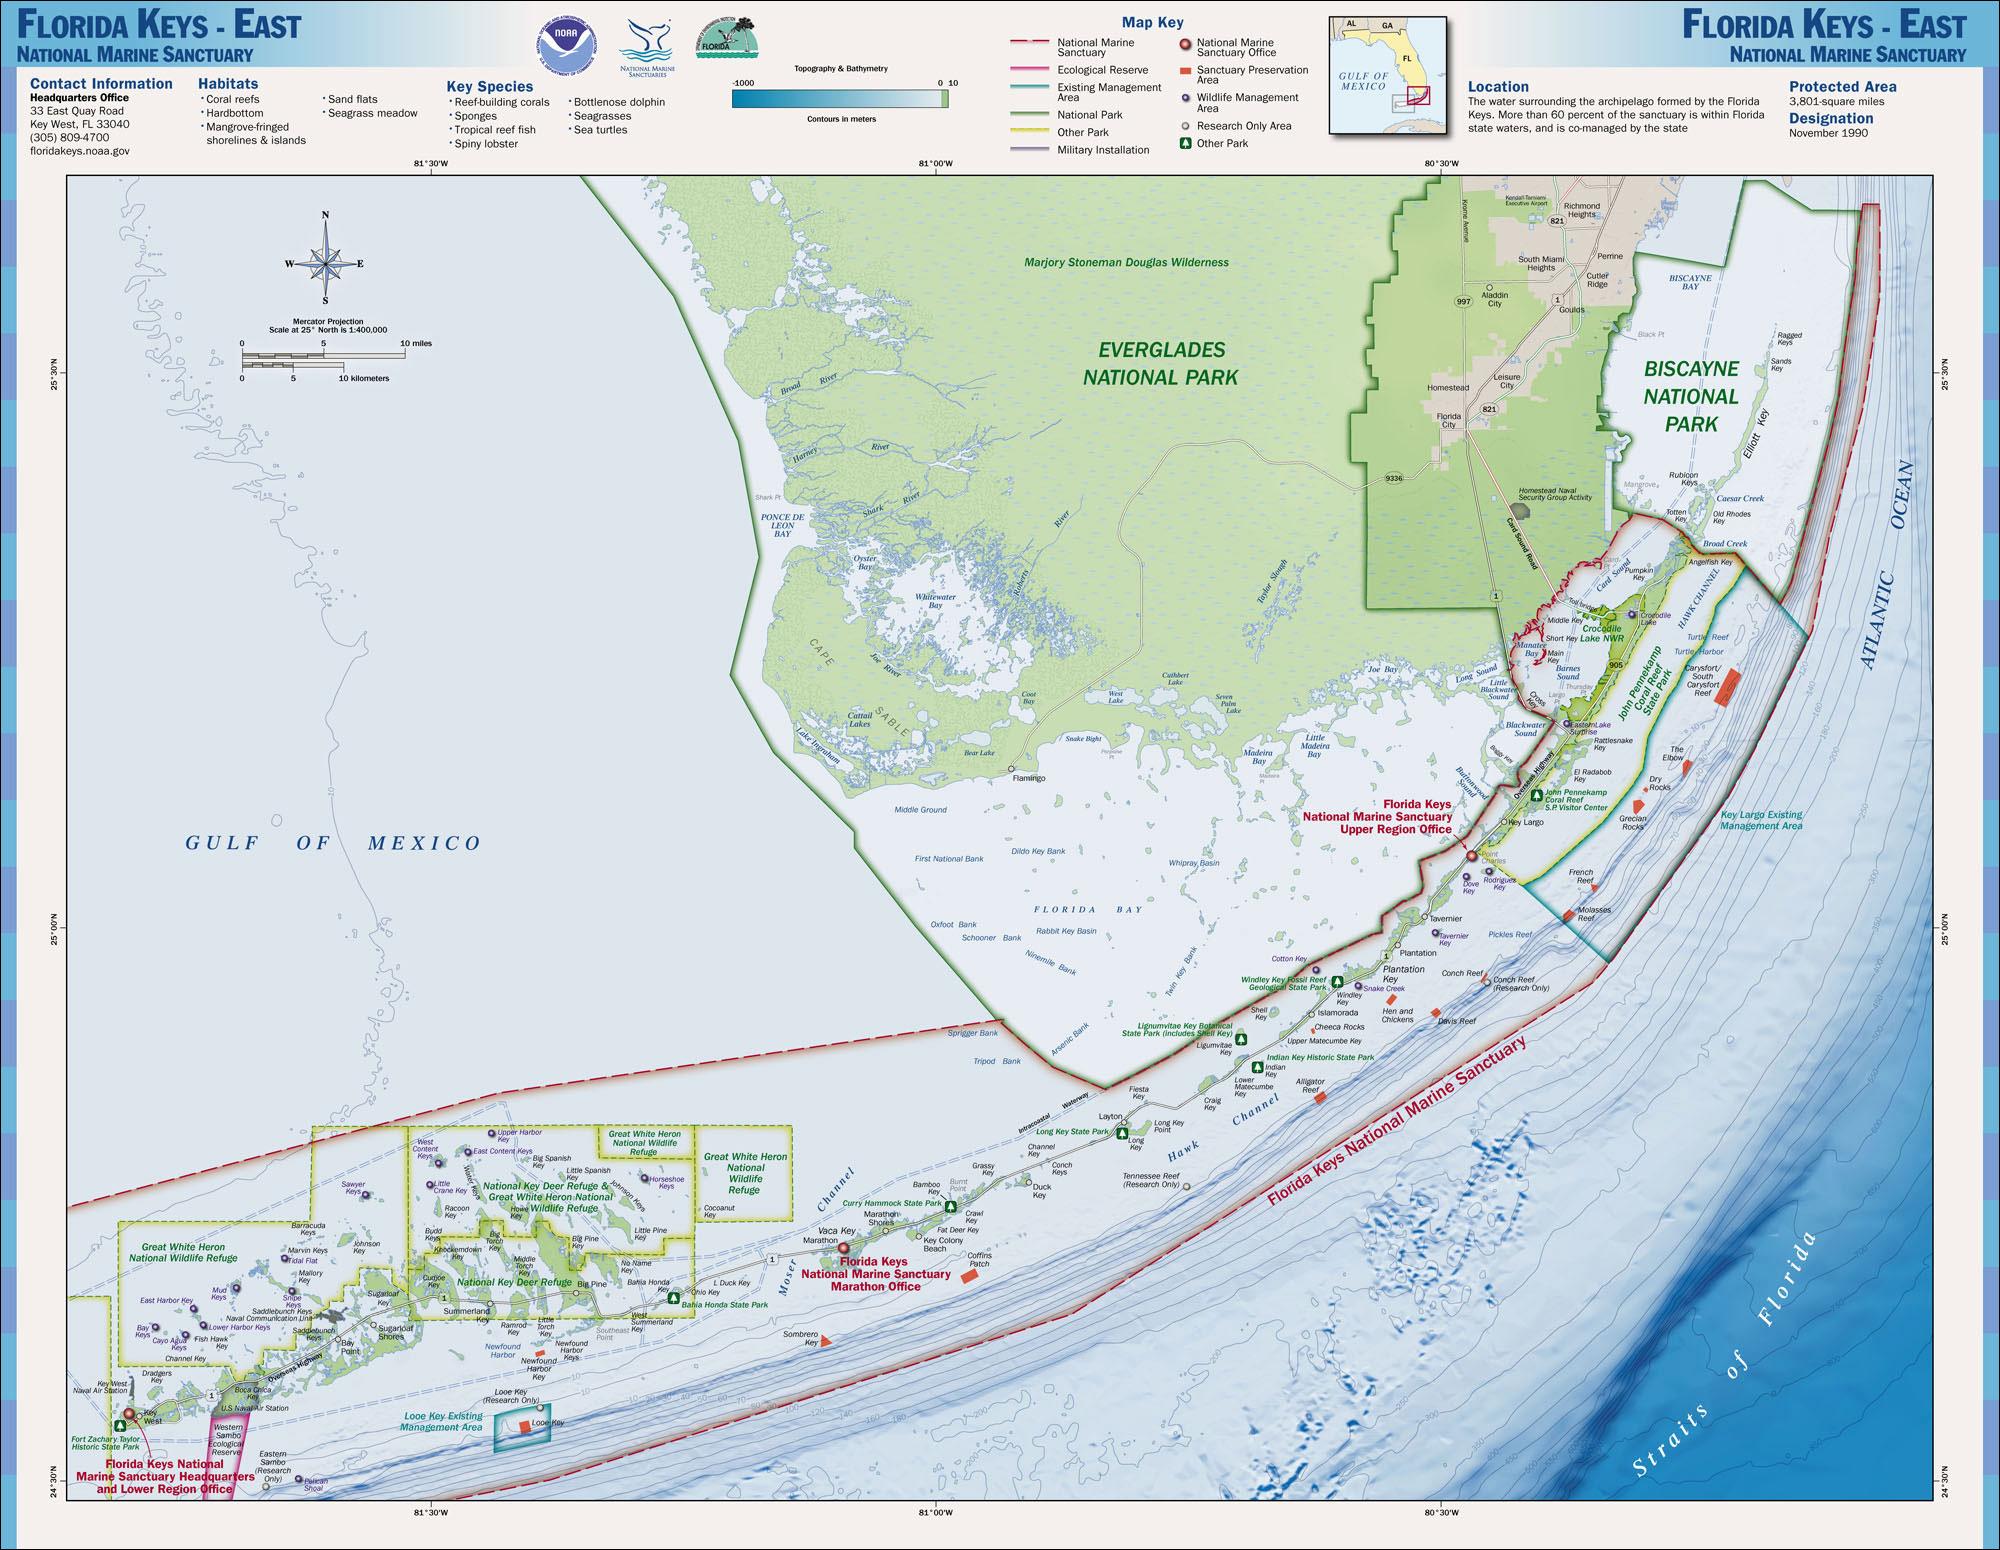 Detecting Detrimental Change In Coral Reefs - Florida Reef Maps App